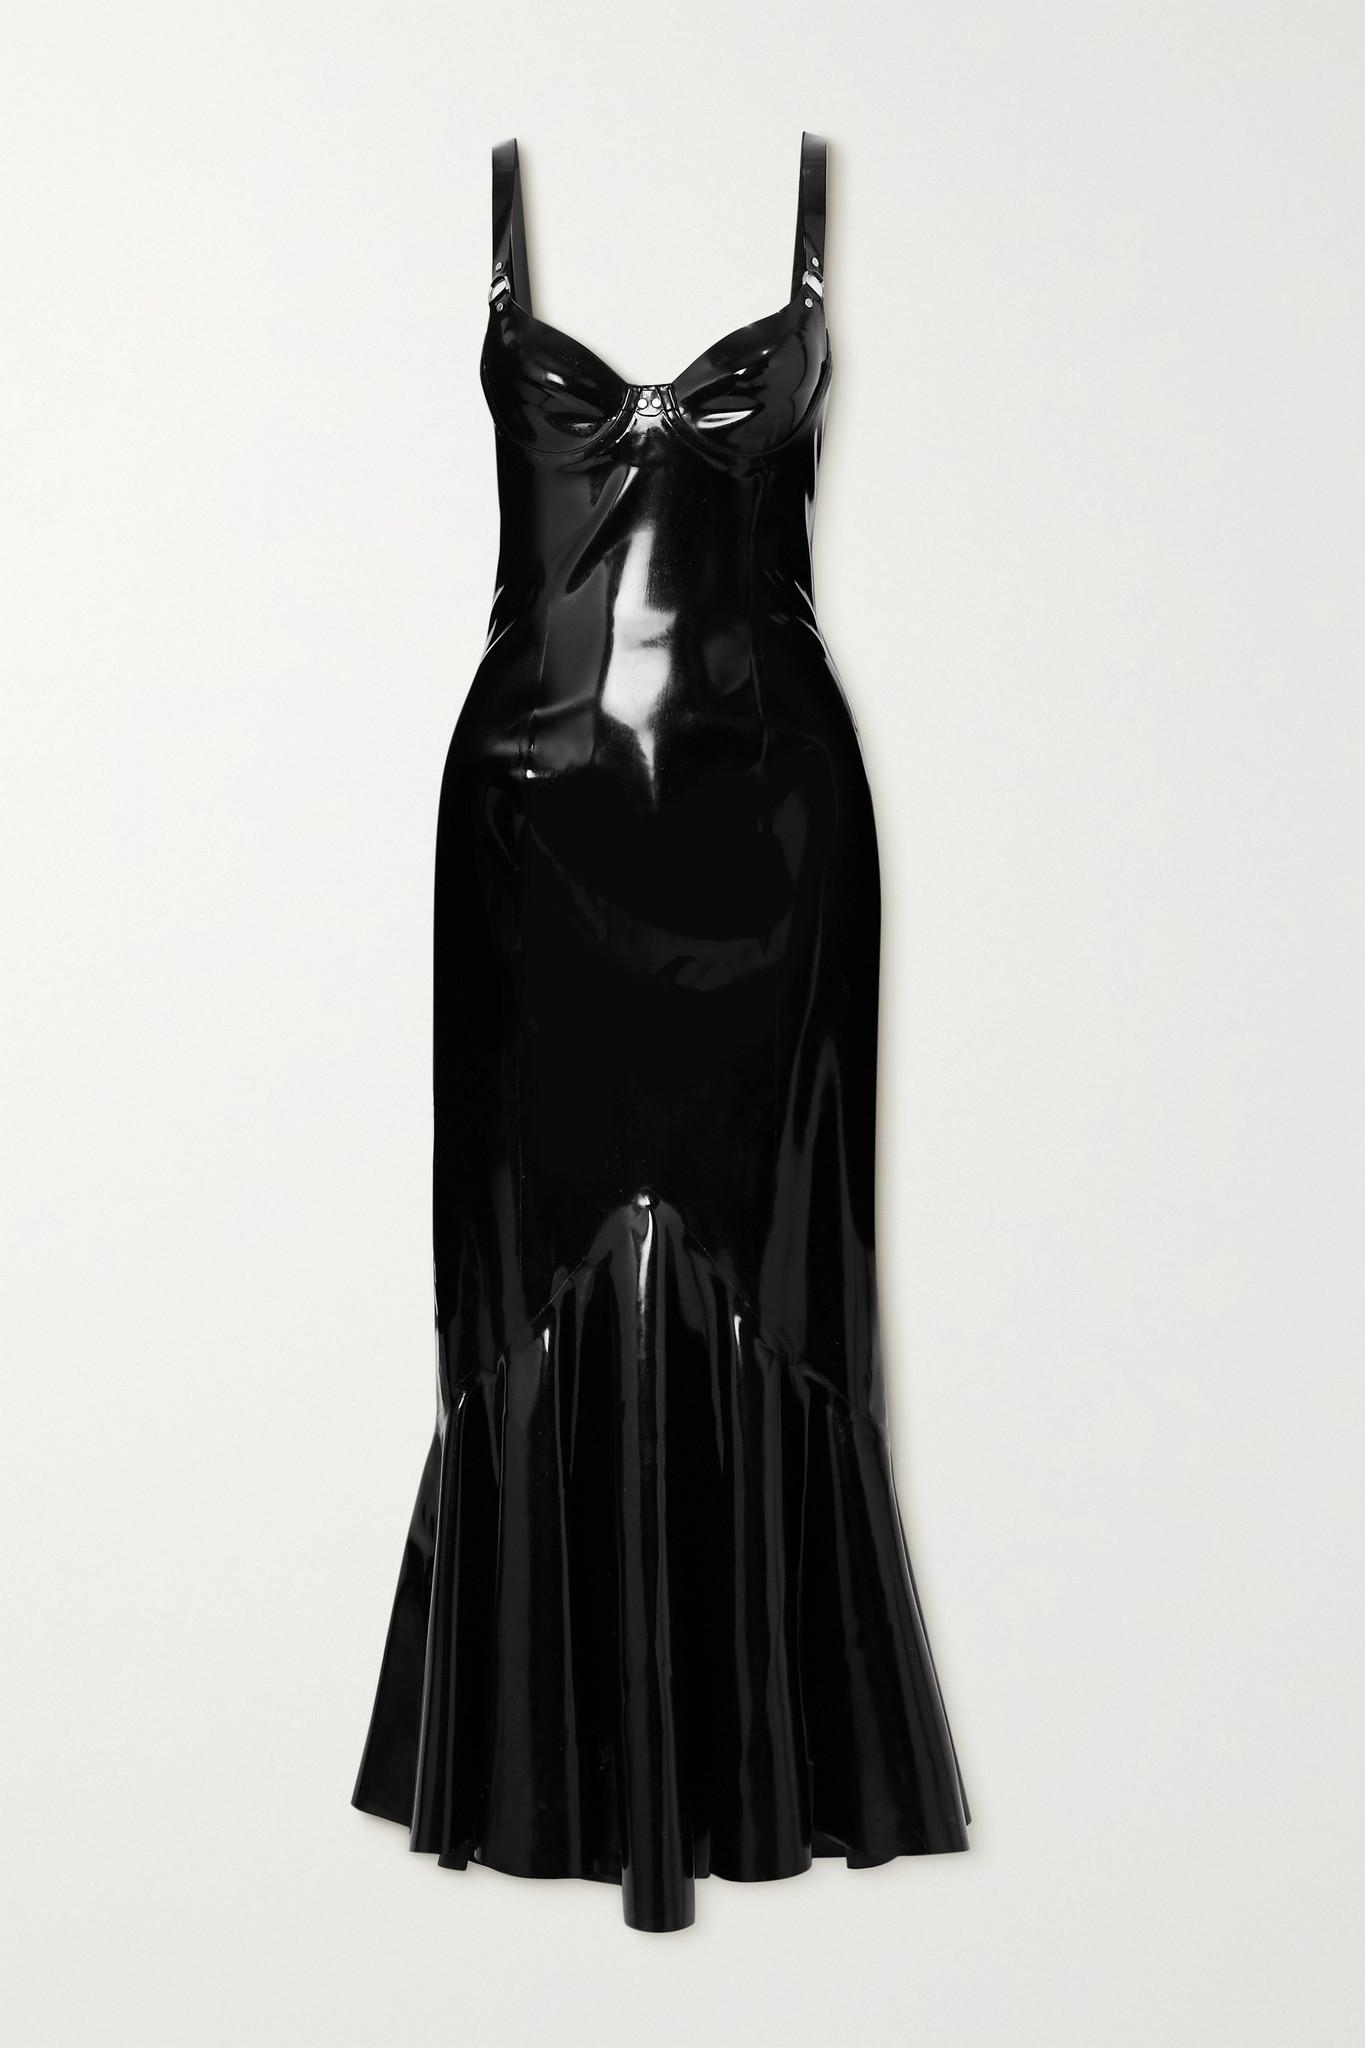 SAINT LAURENT - Latex Midi Dress + Latex Care Cleaning Kit 3 X 30ml Bottles (vividress, Vivishine, V